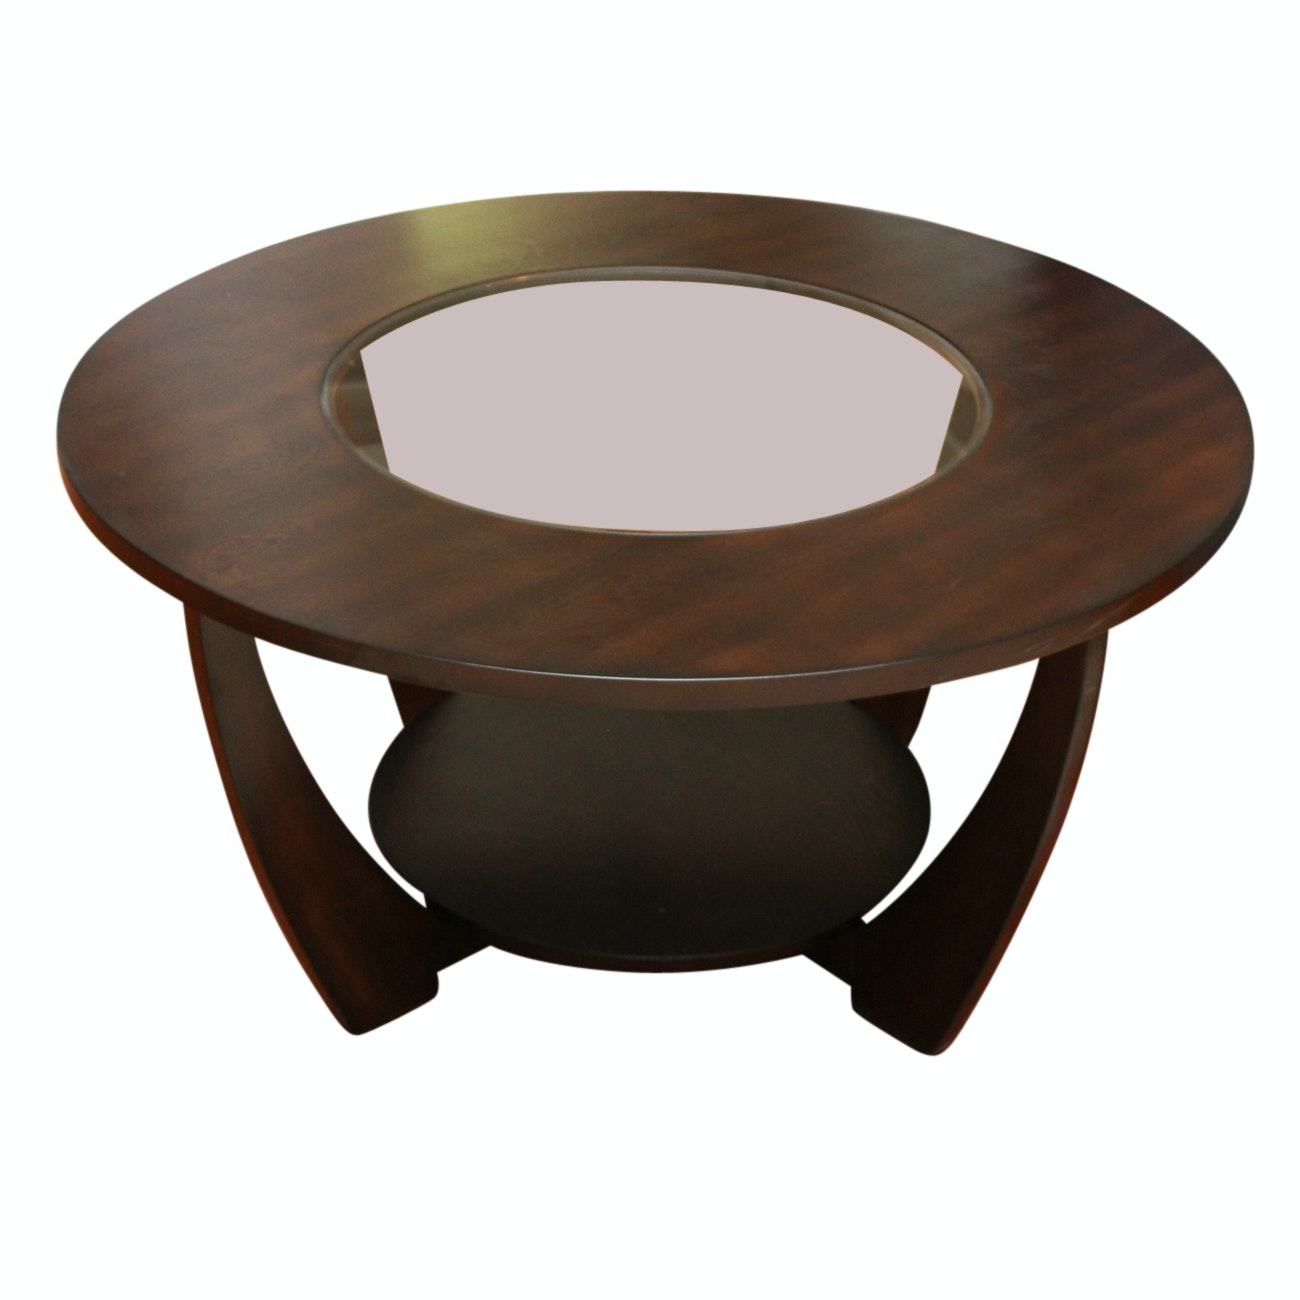 Circular Wood and Glass Coffee Table